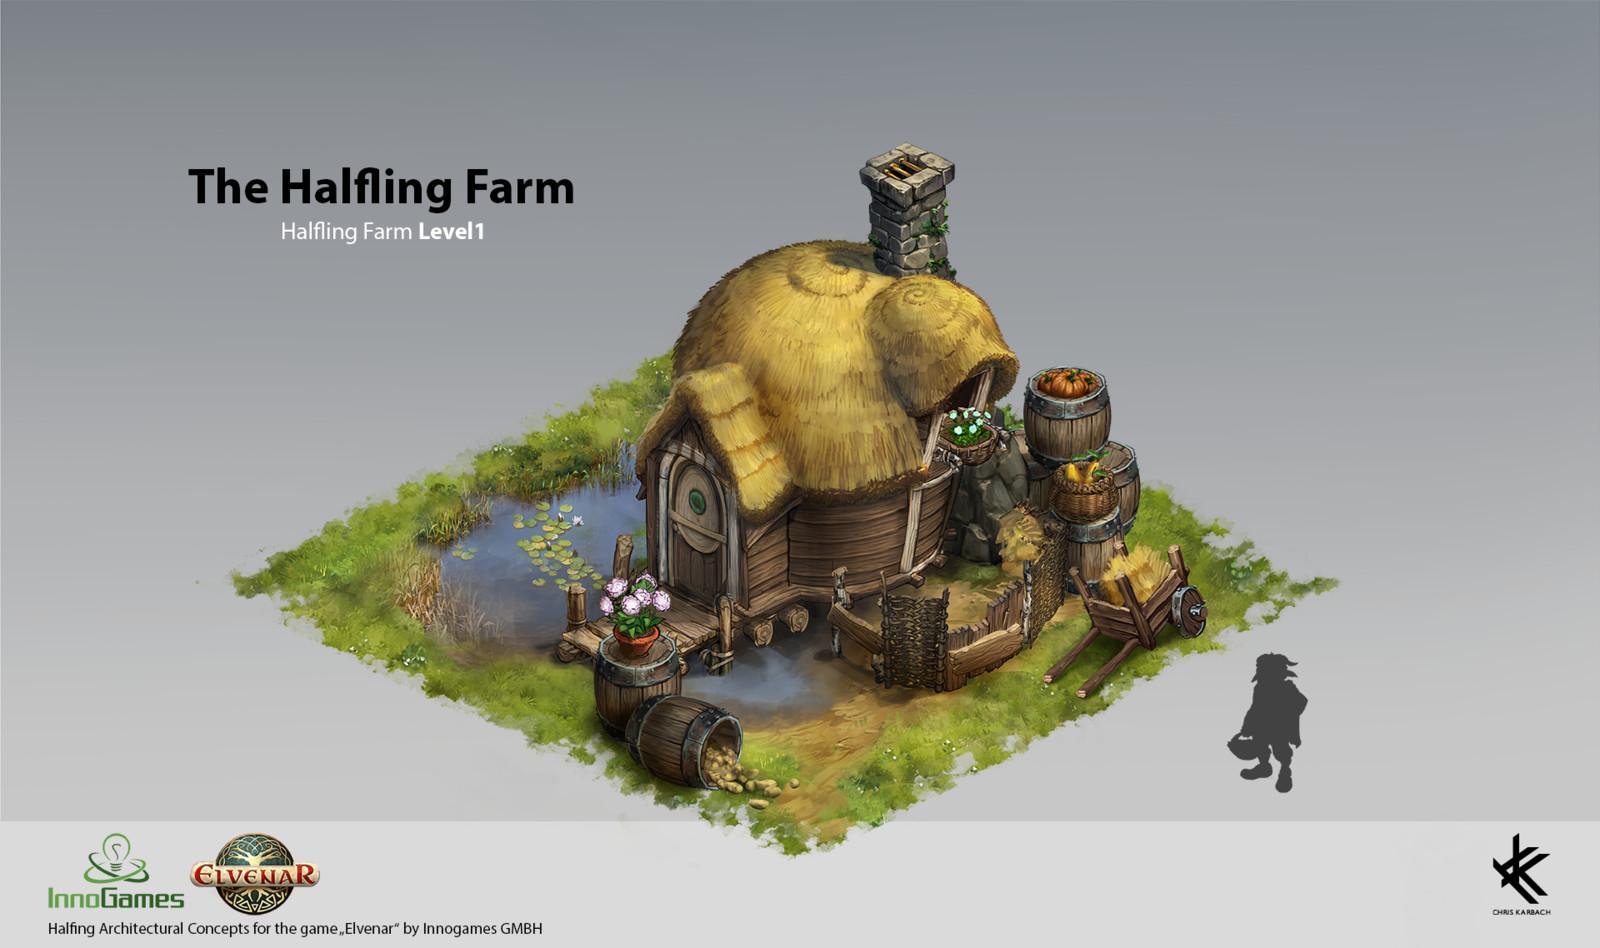 Halfling Farm Level 1